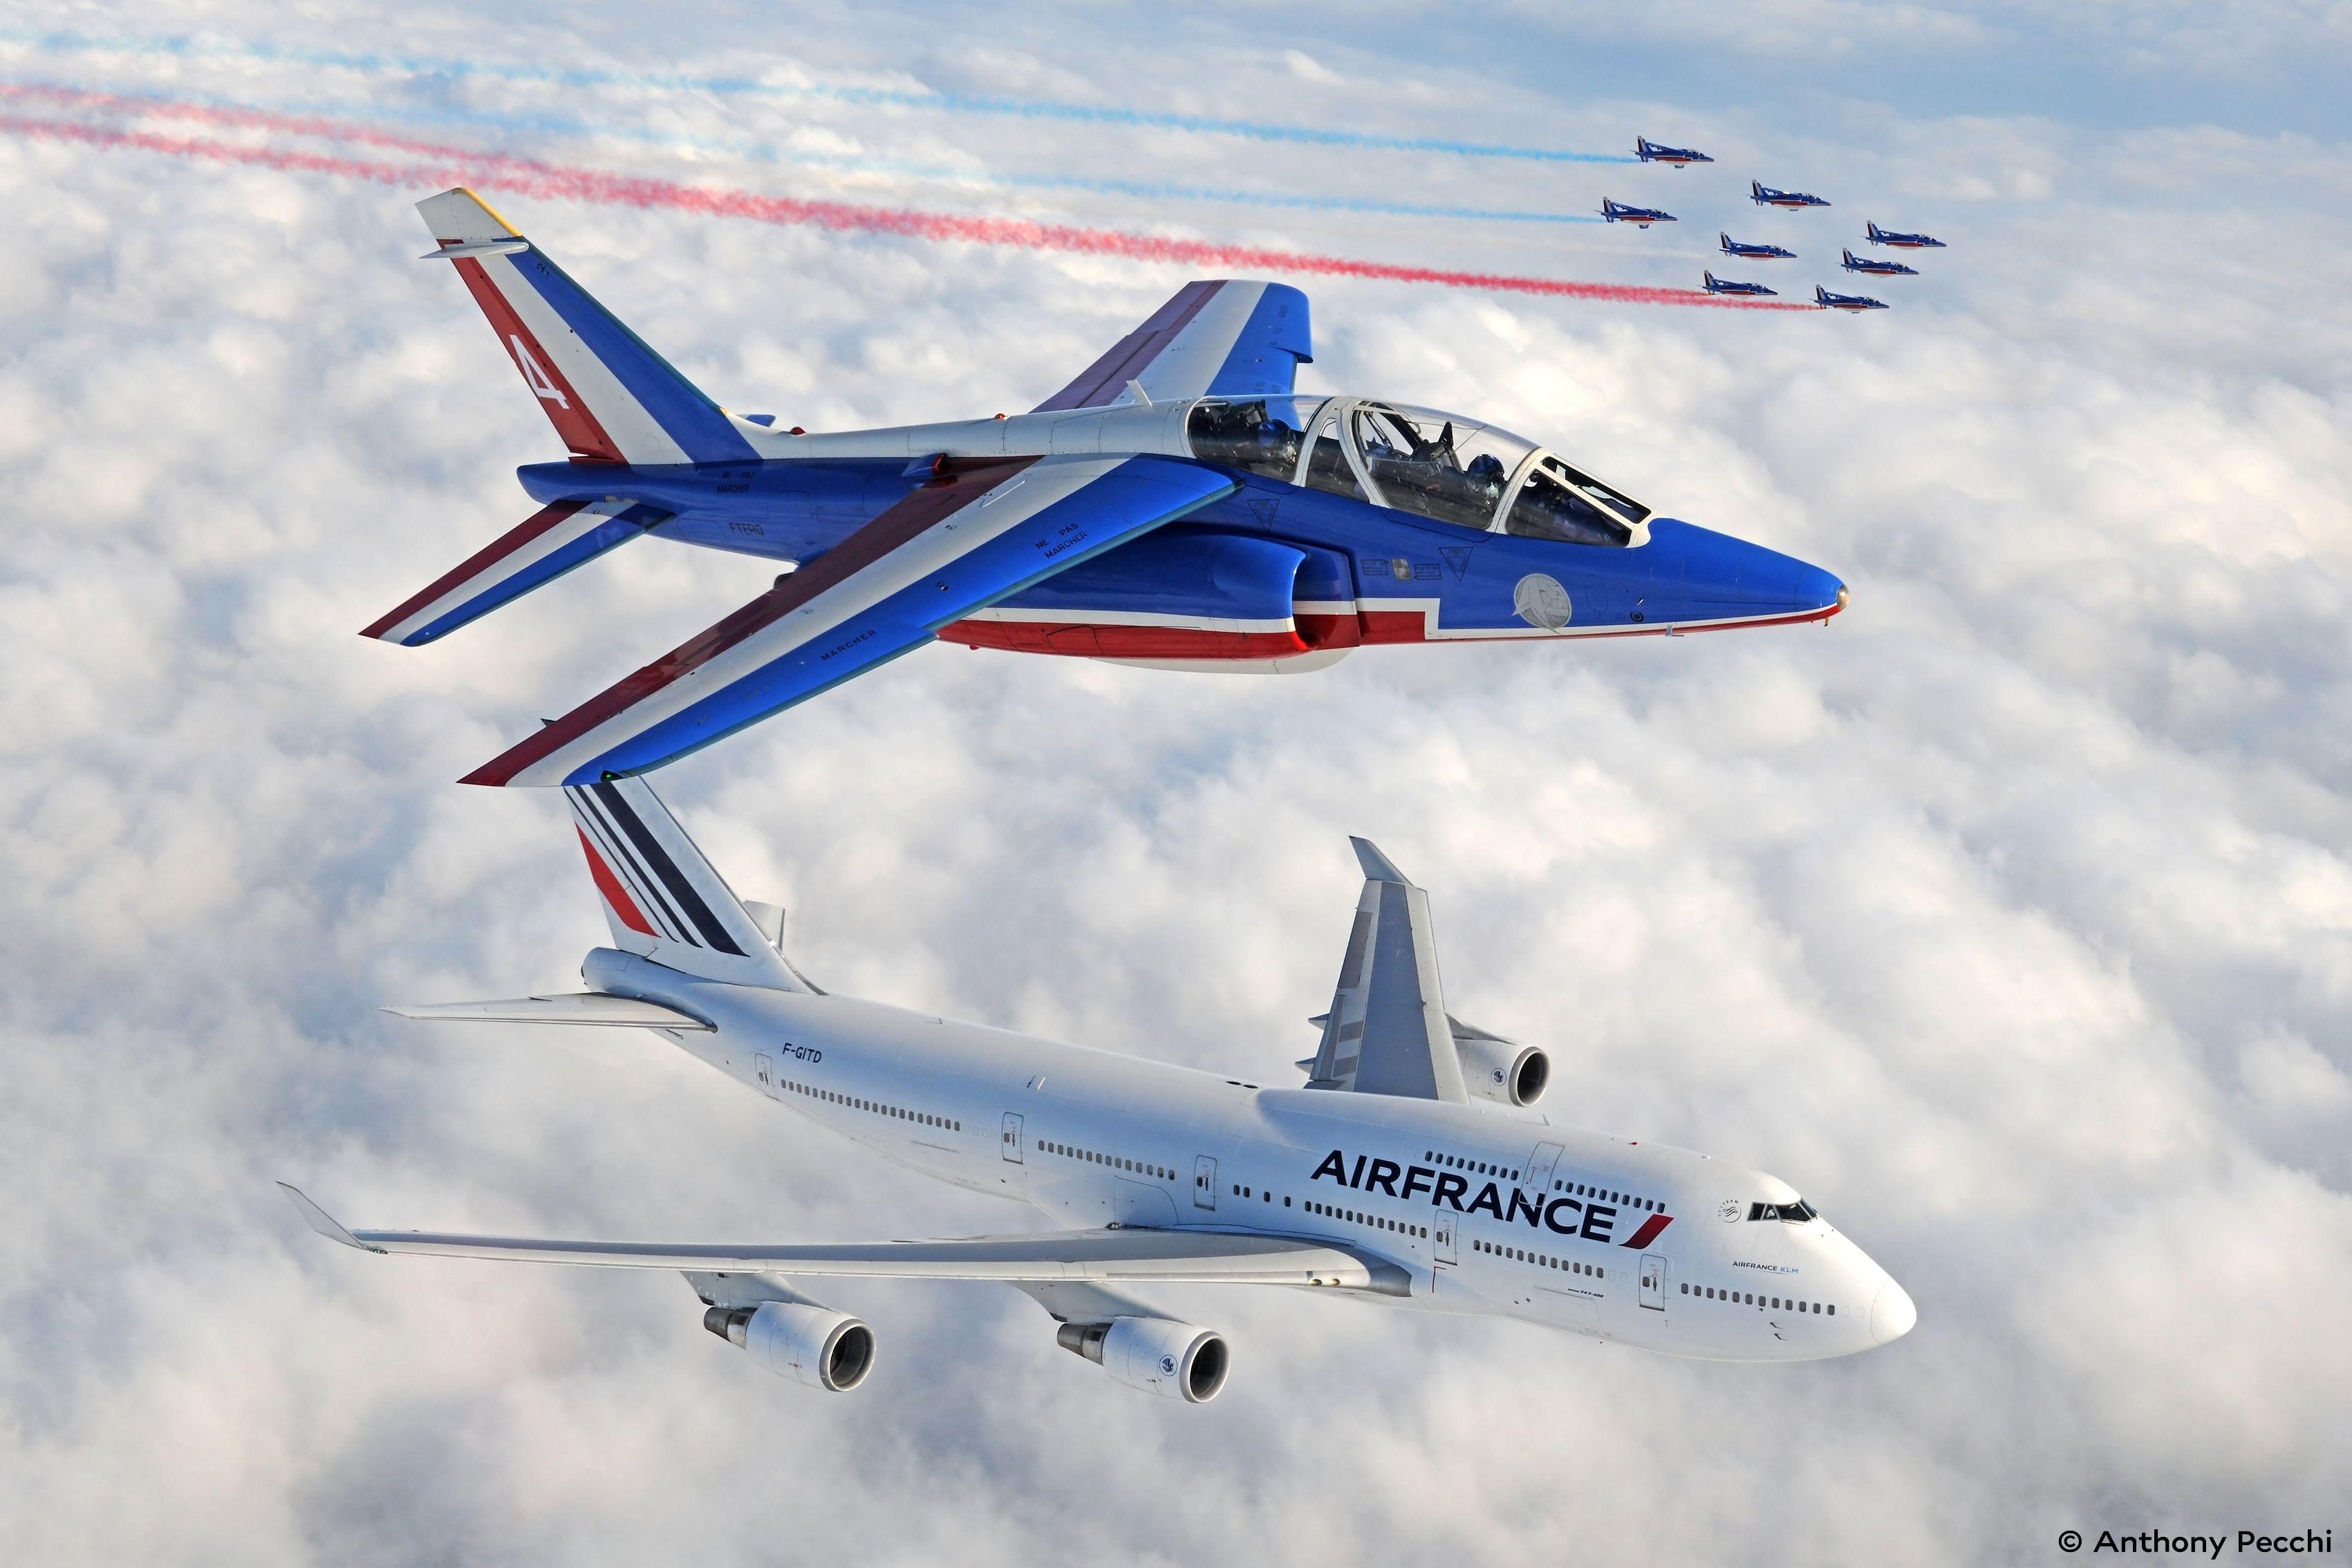 Video Patrouille De France Si Boeing 747 Air France Air France